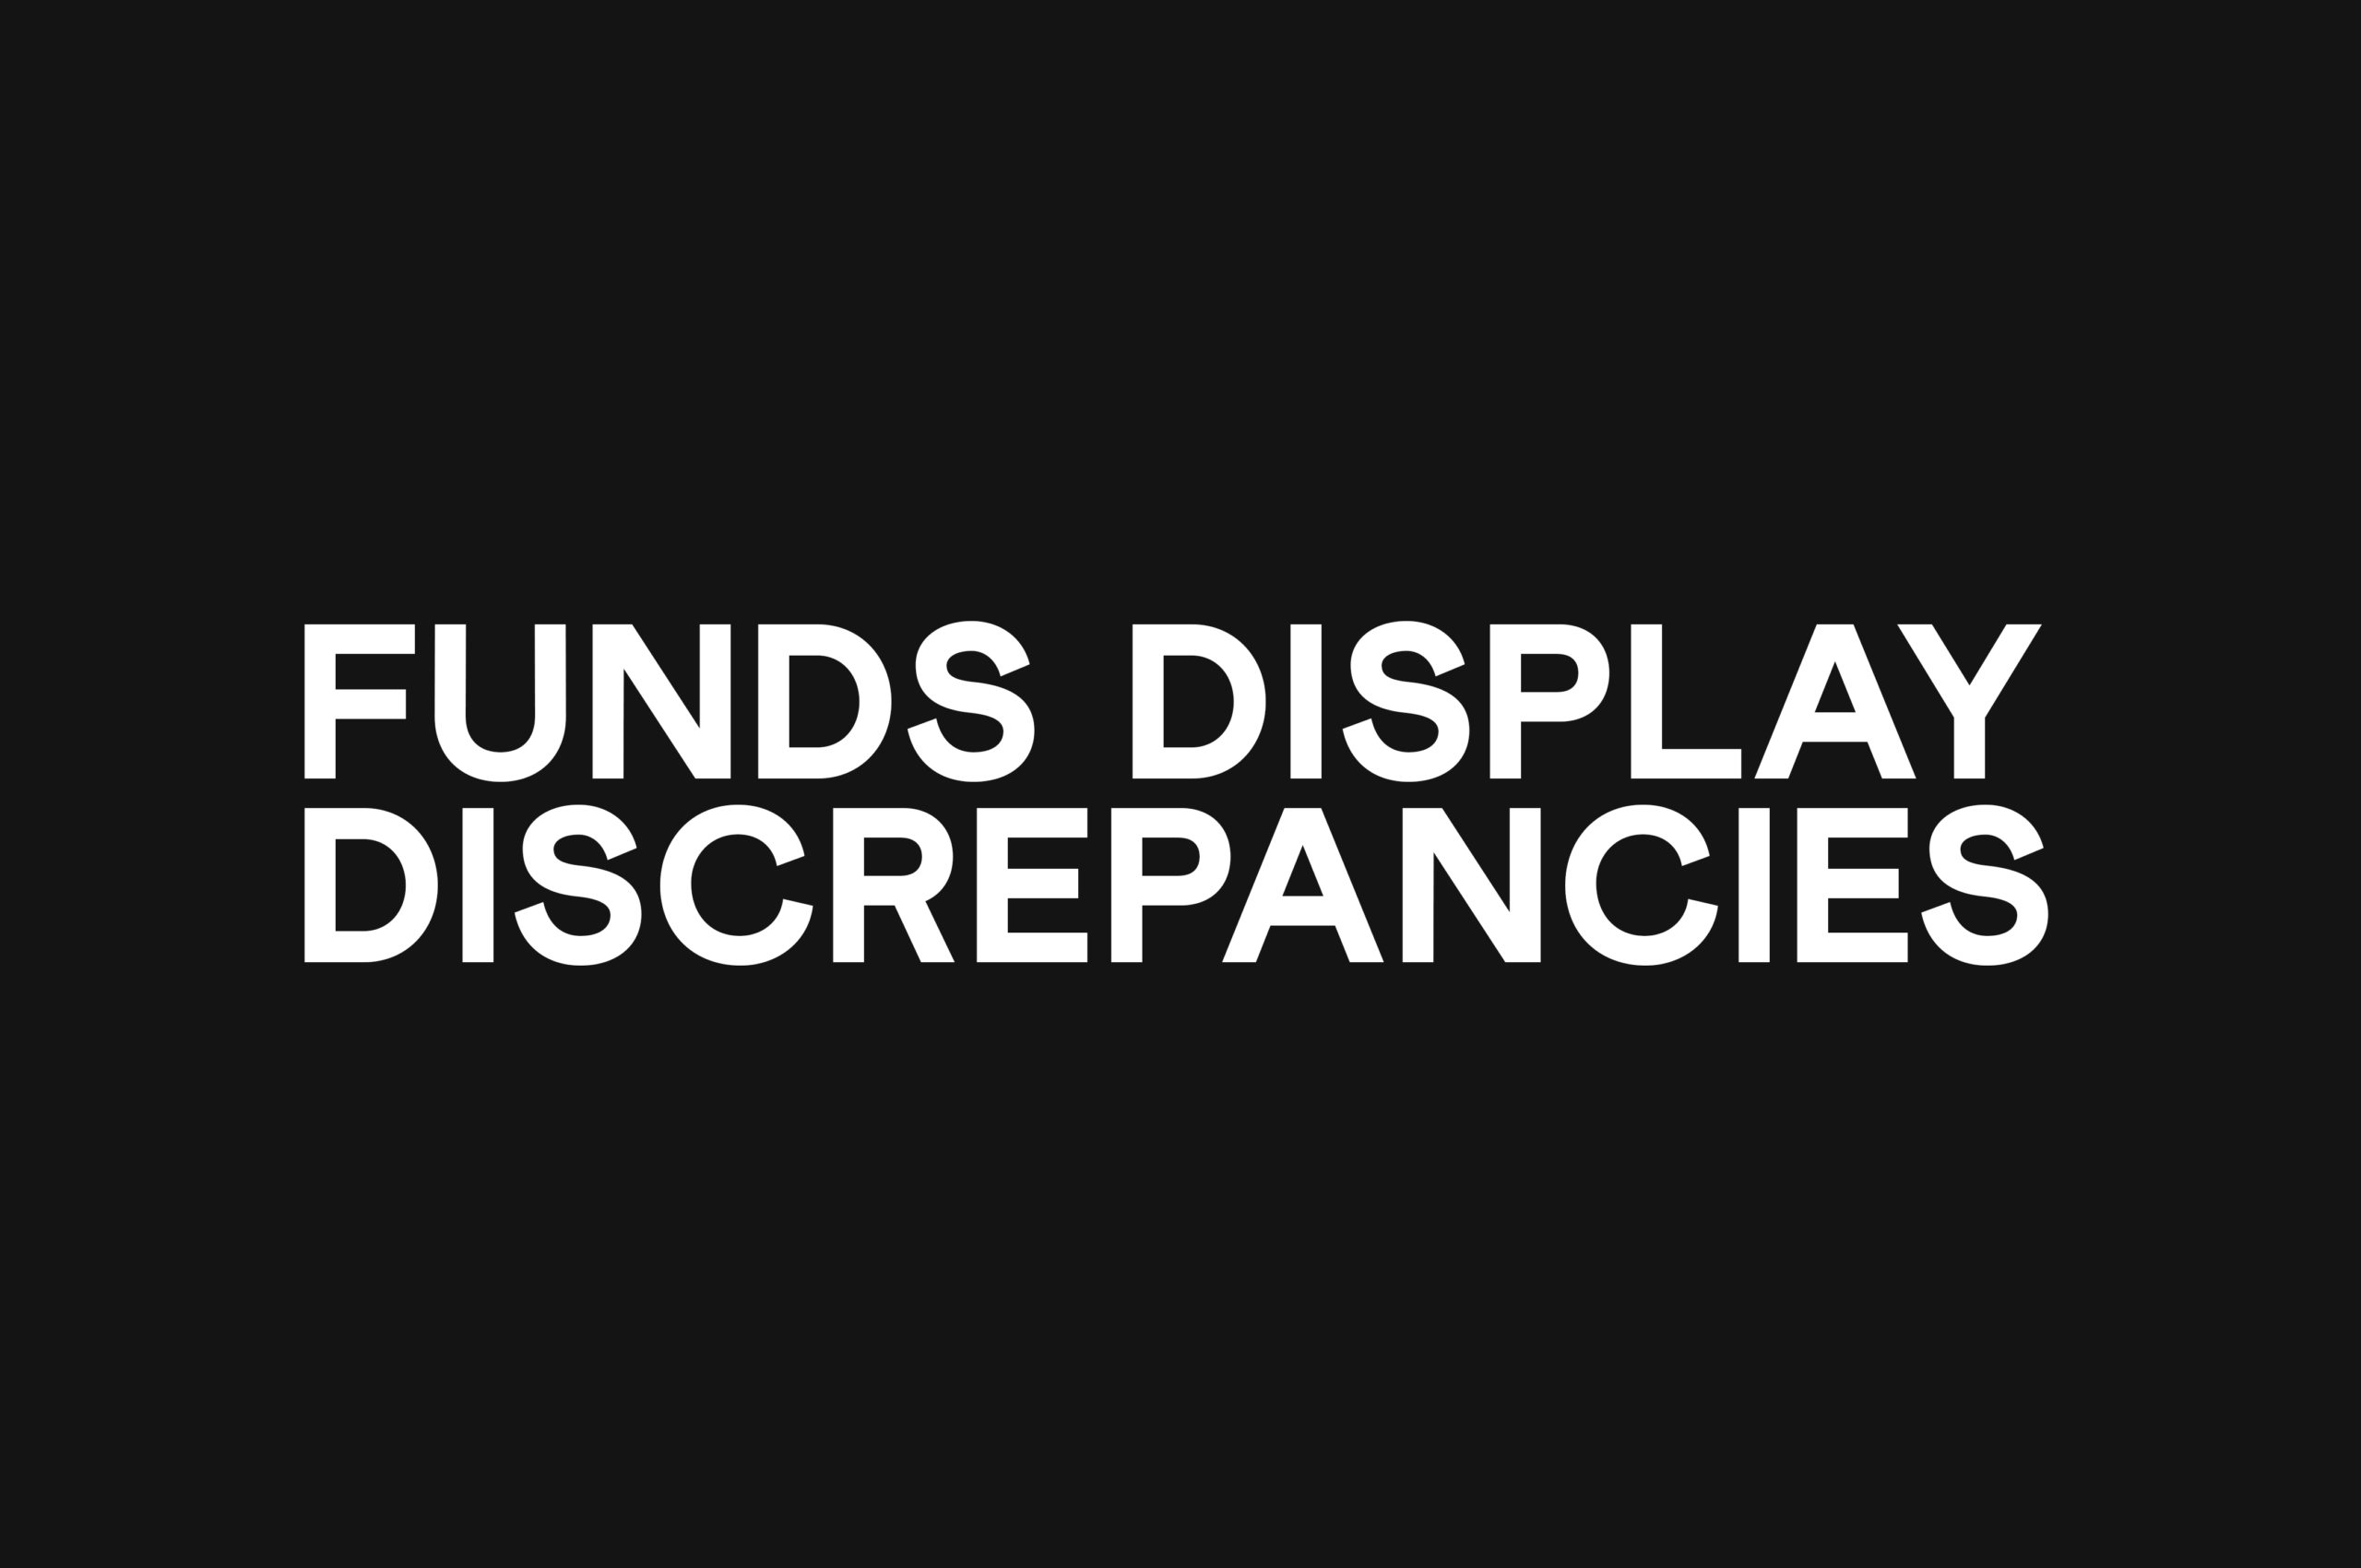 Funds Display Discrepancies